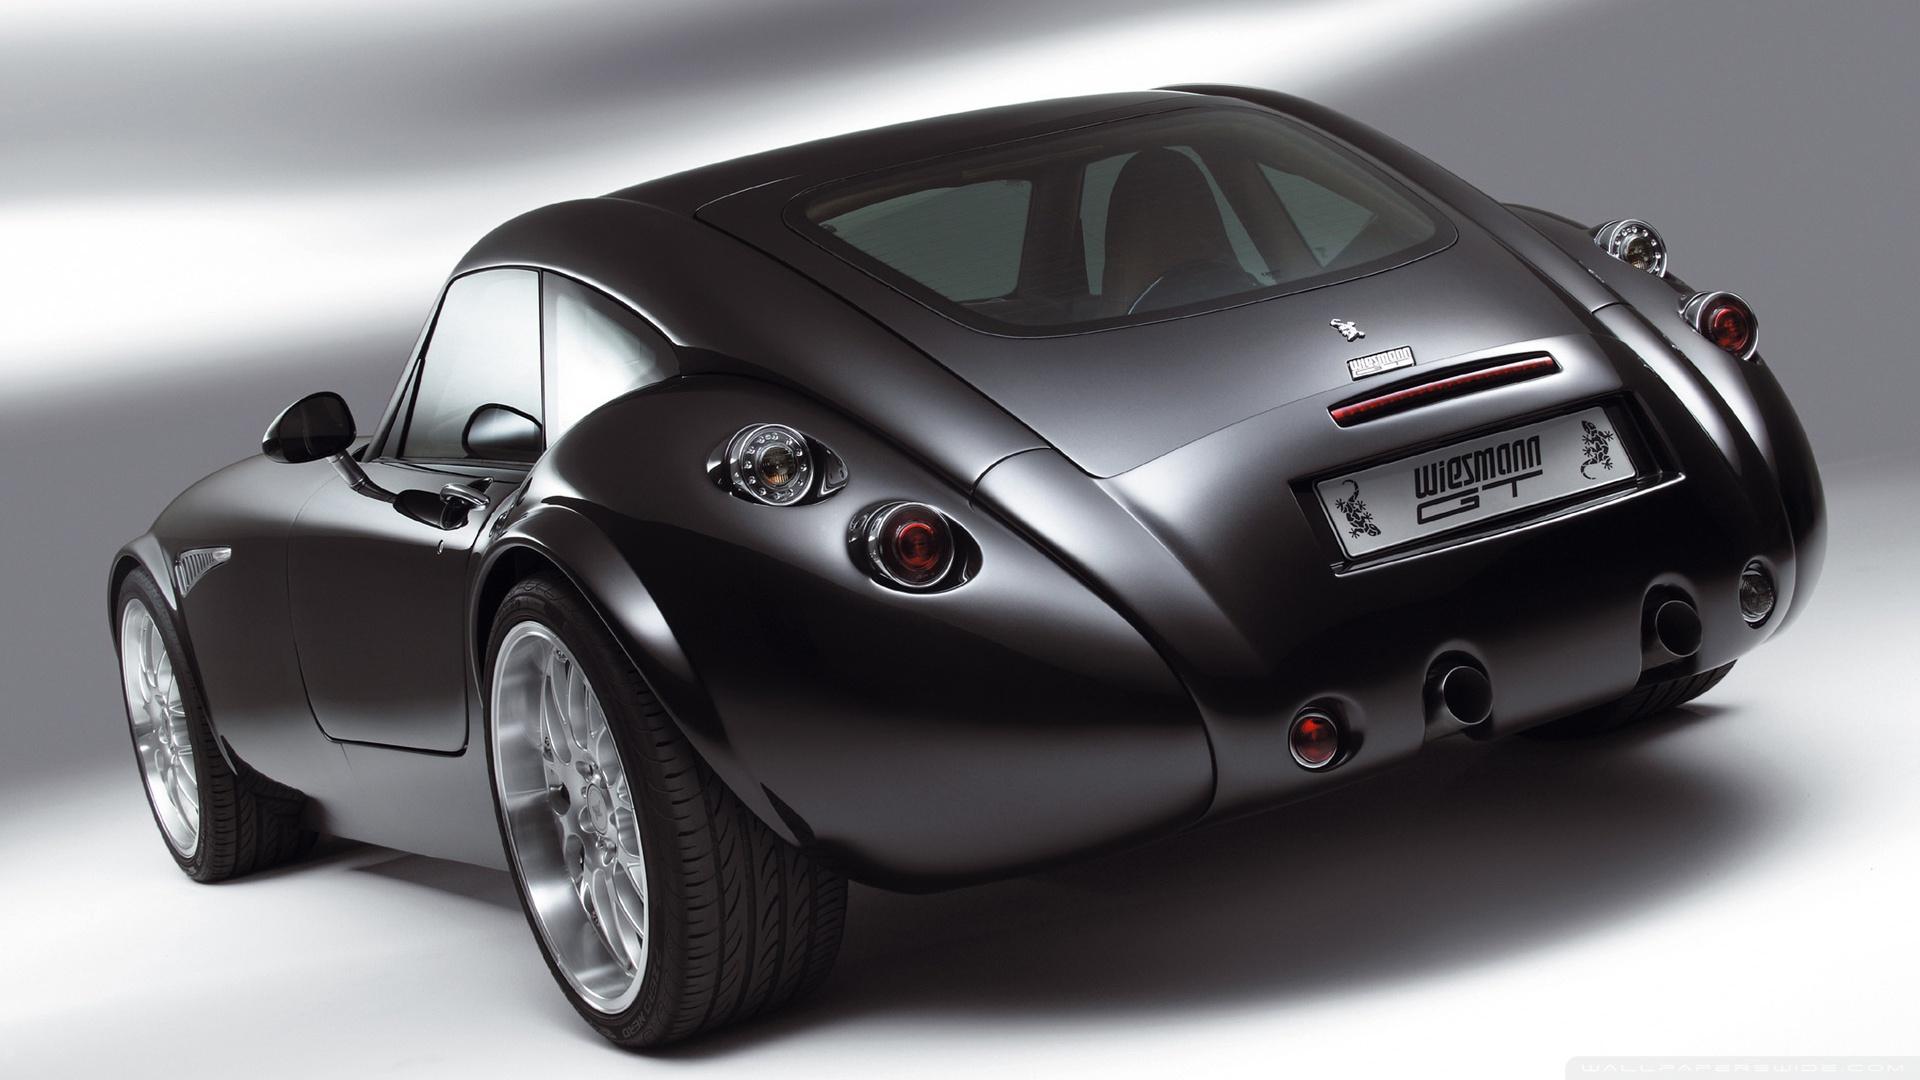 Cool Sport Cars Wallpaper For Mobile Wiesmann Gt Car Back 4k Hd Desktop Wallpaper For 4k Ultra